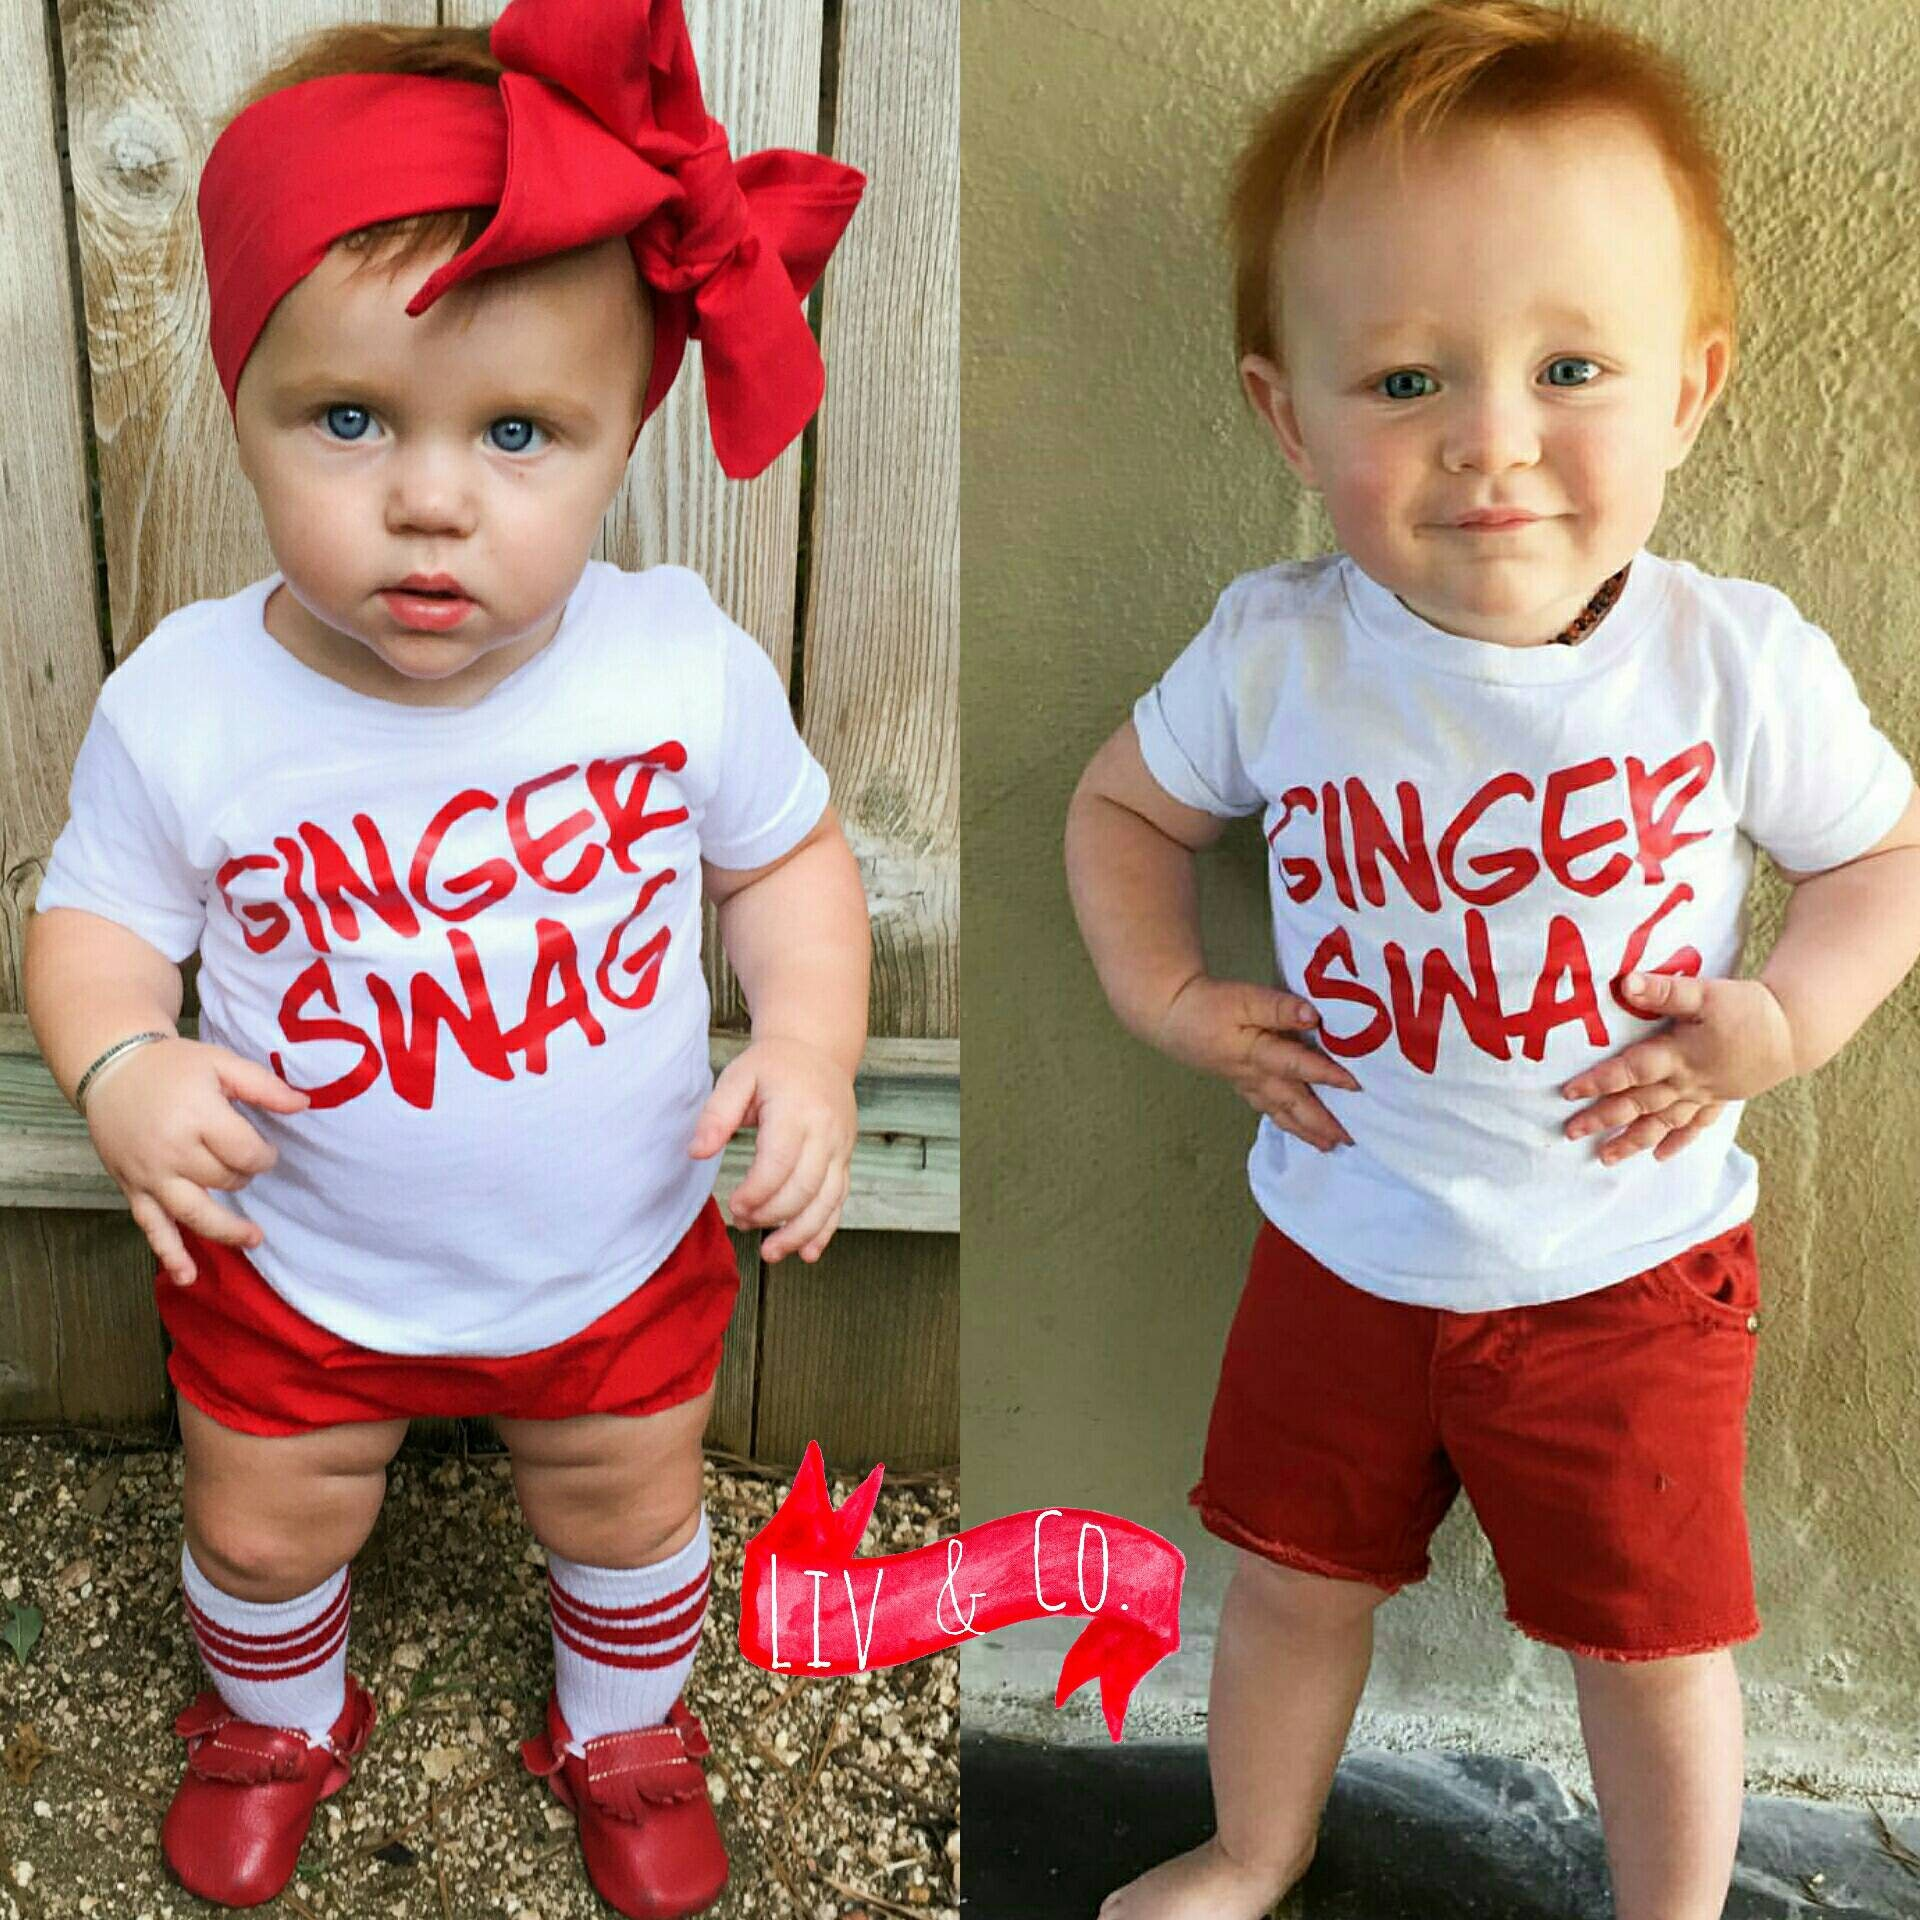 Baby swag boy photo best photo